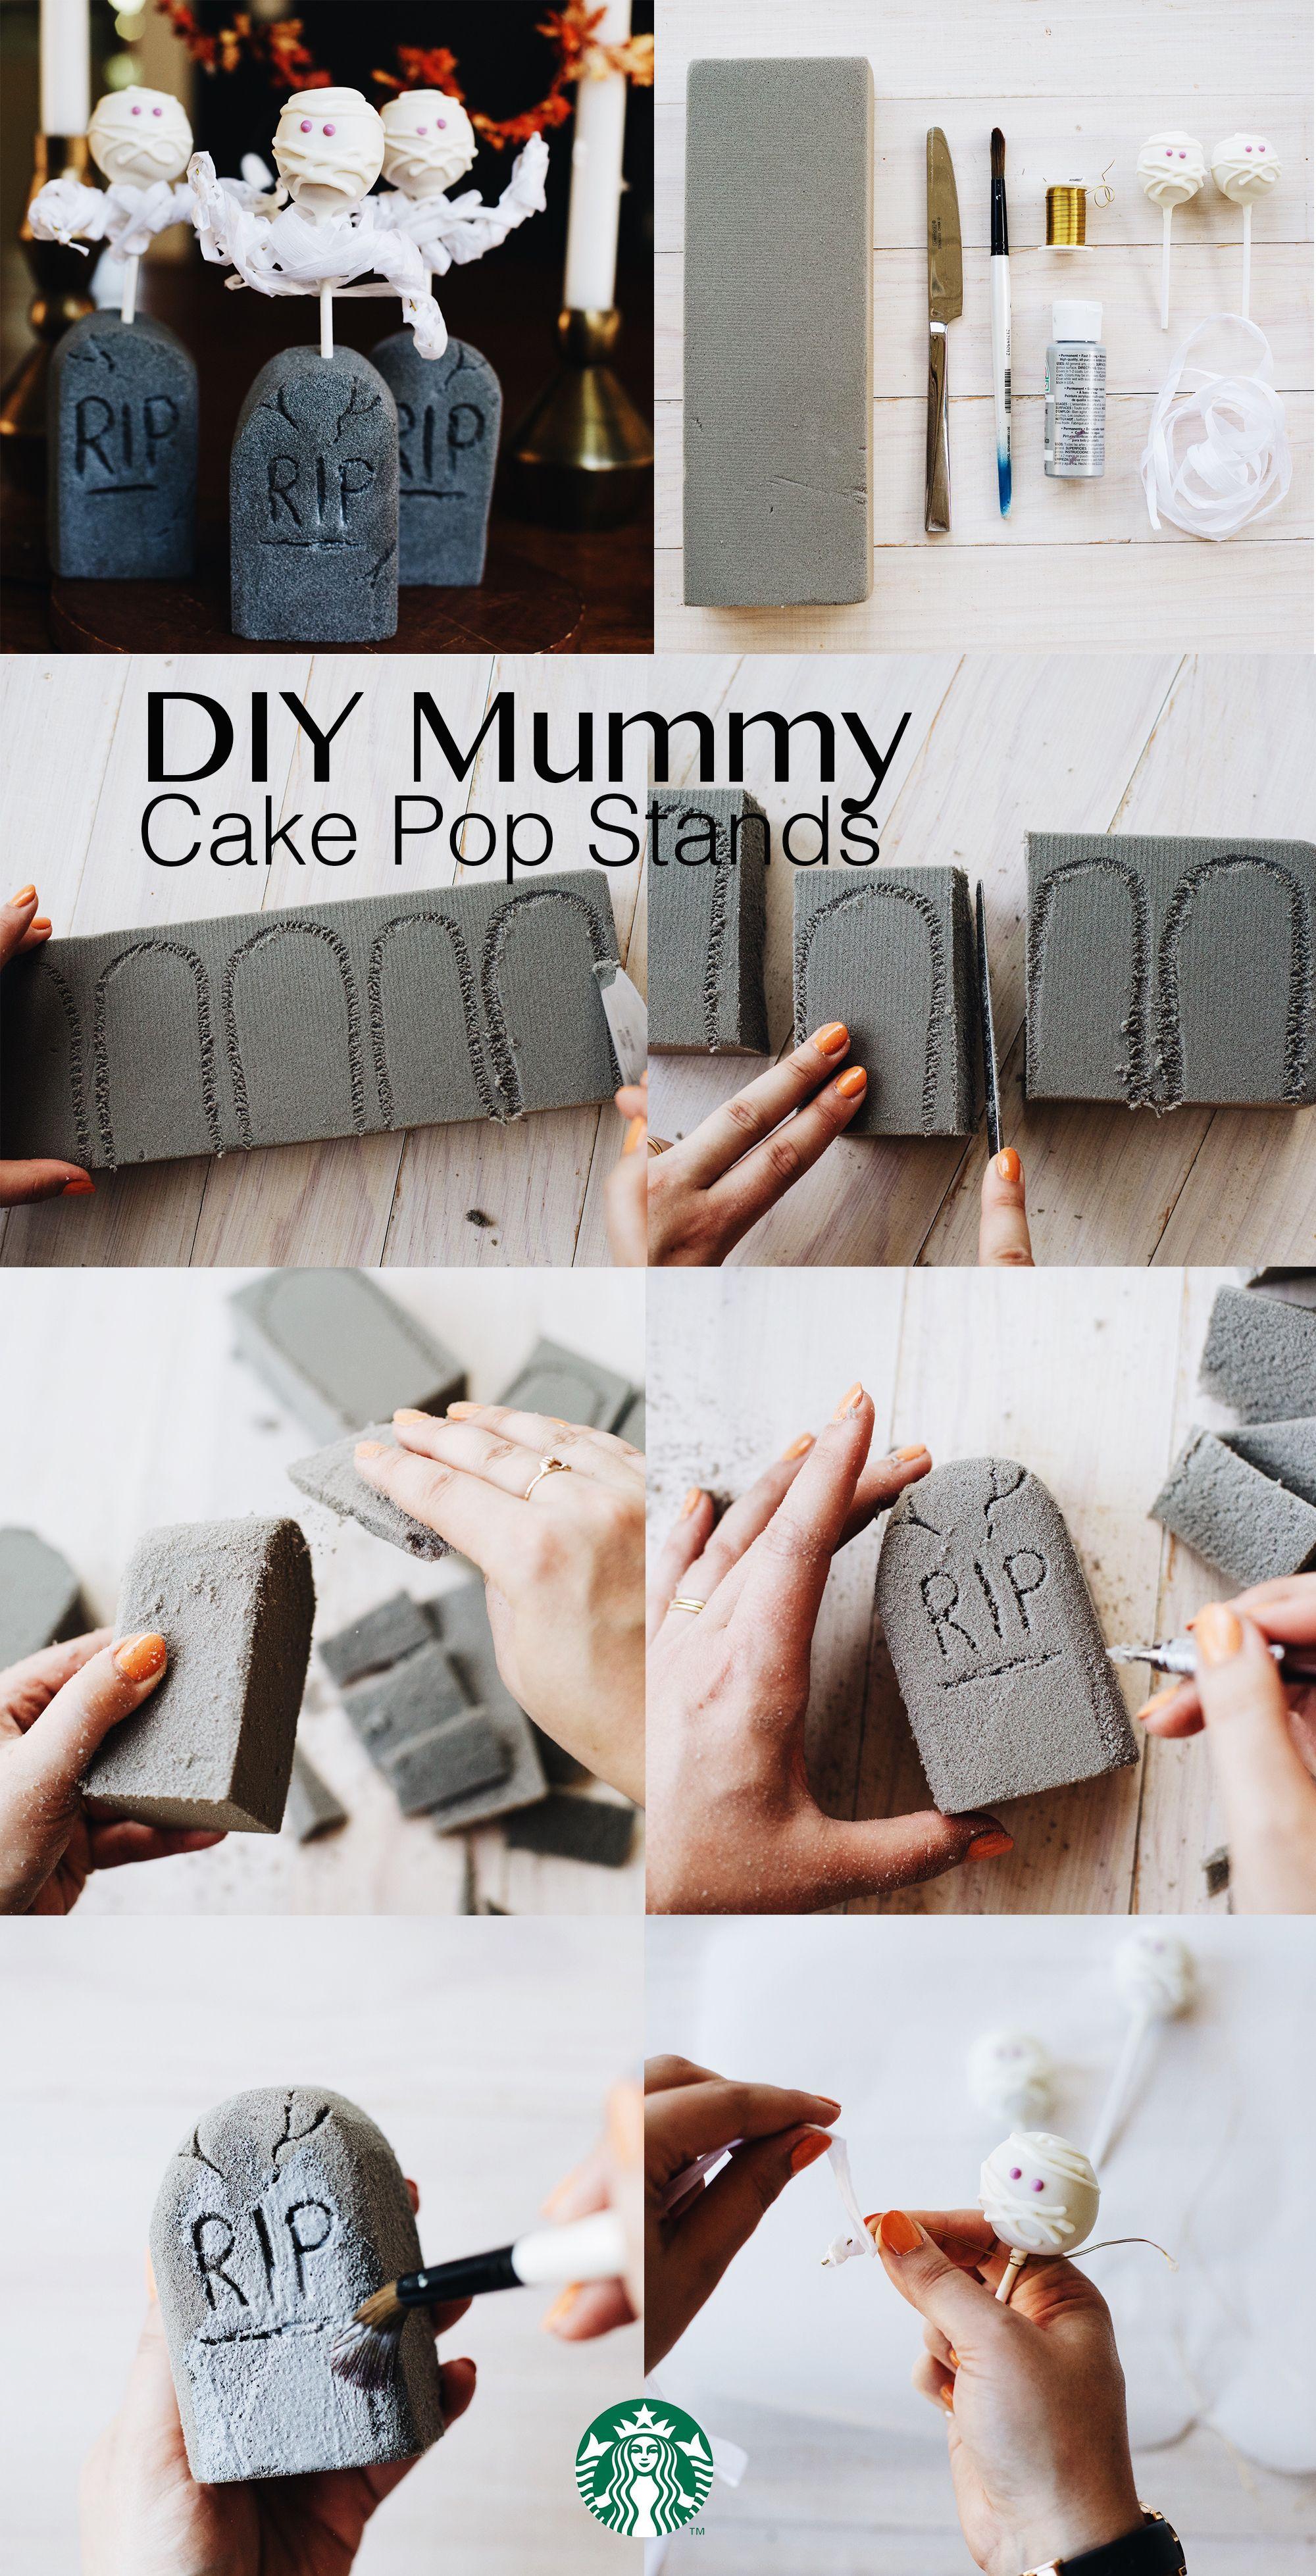 Starbucks Mummy Cake Pop Stands 1 Cut Headstone Shapes